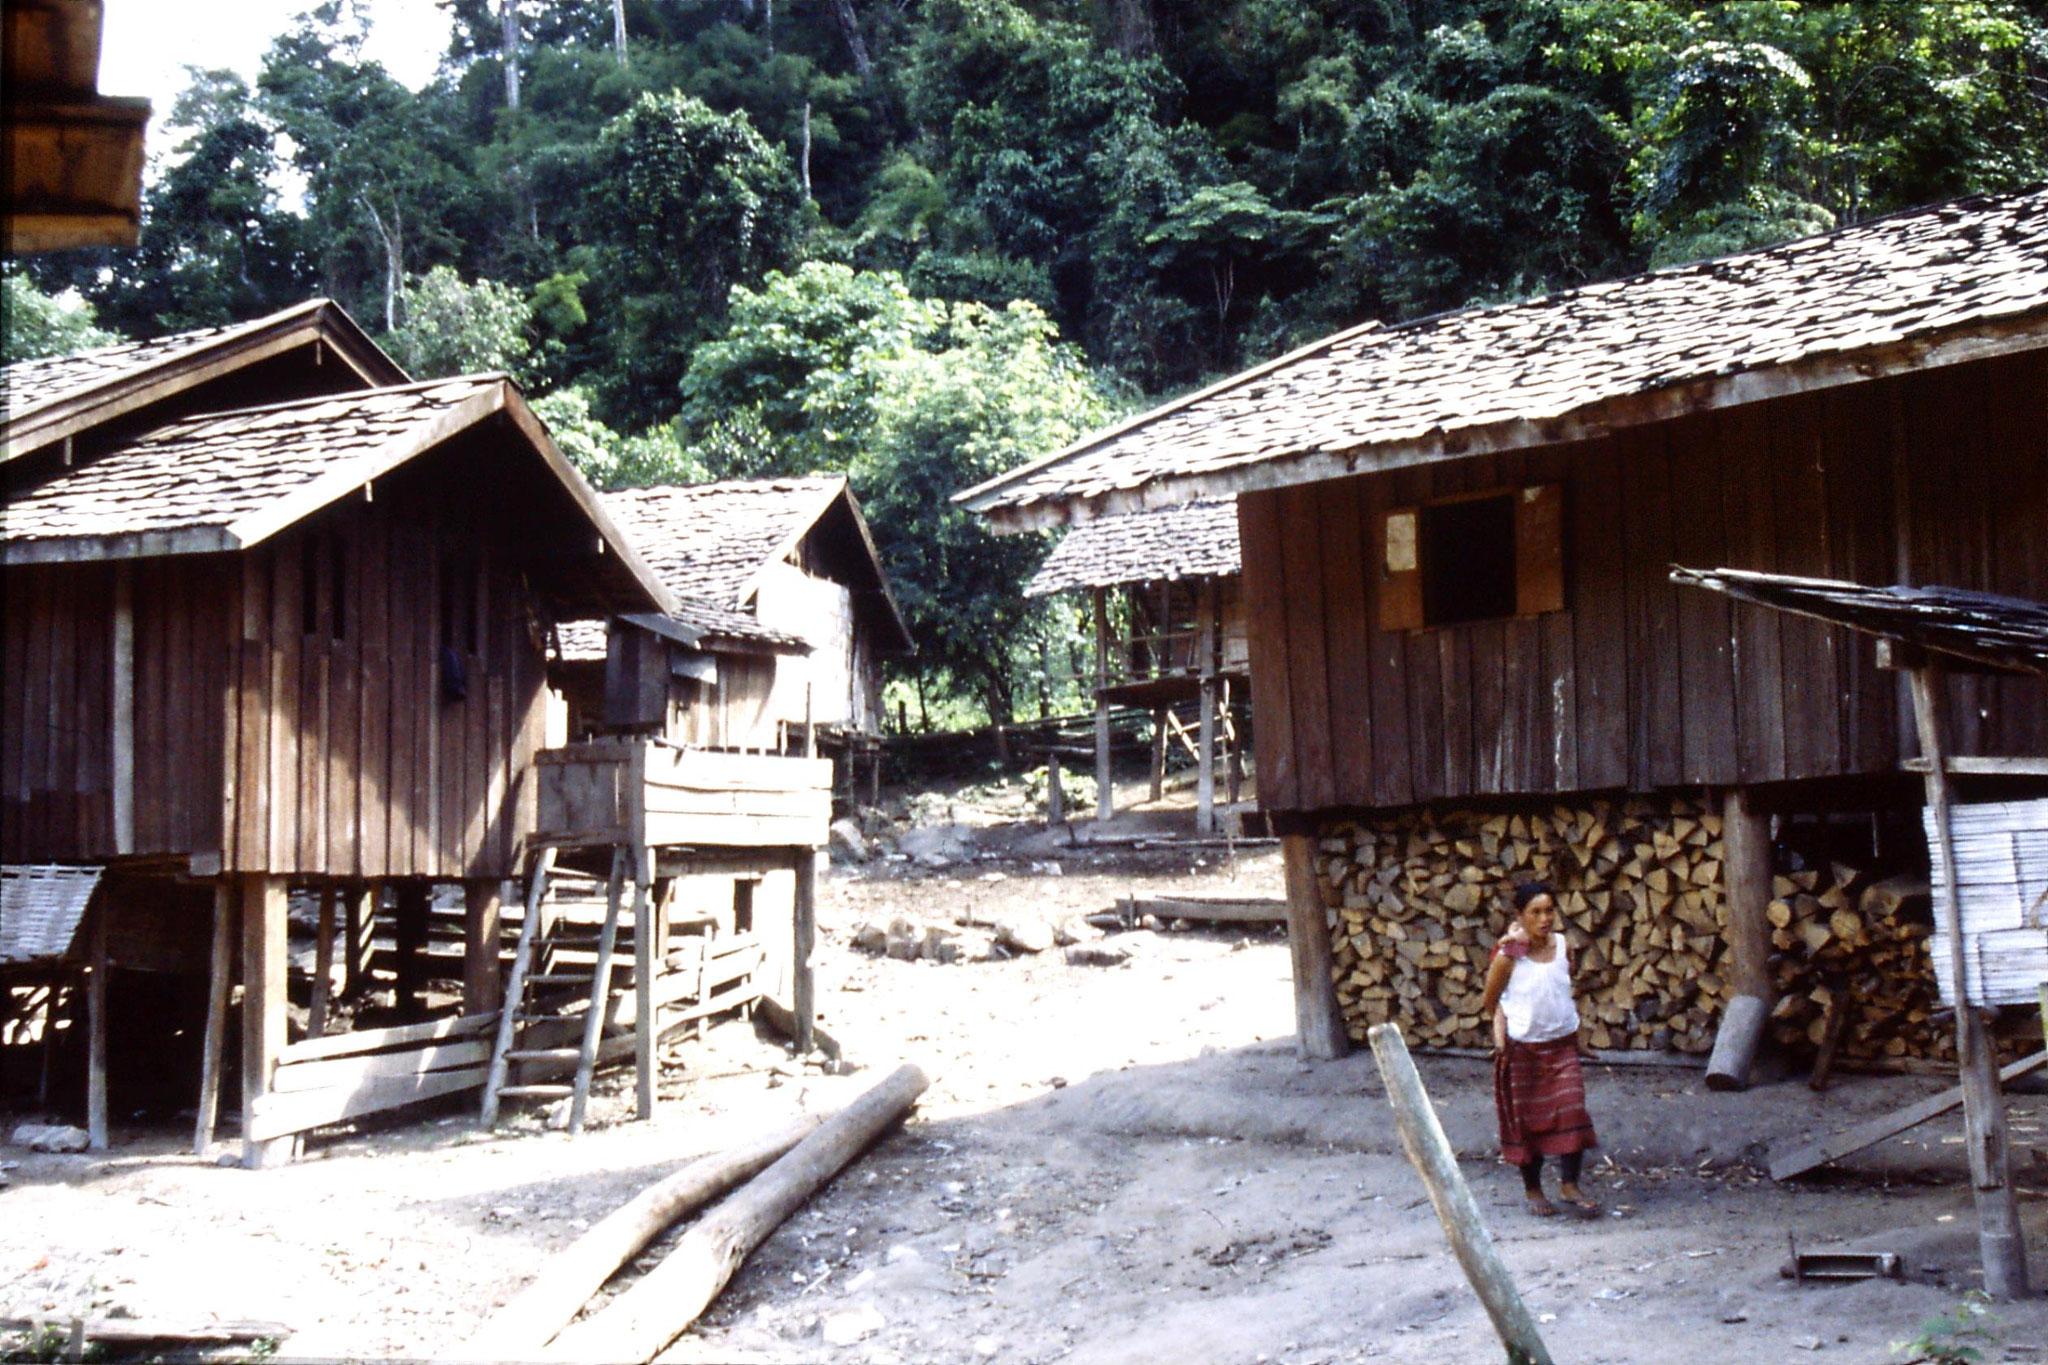 12/6/1990: 26: Trek - Hue Kom Karen village